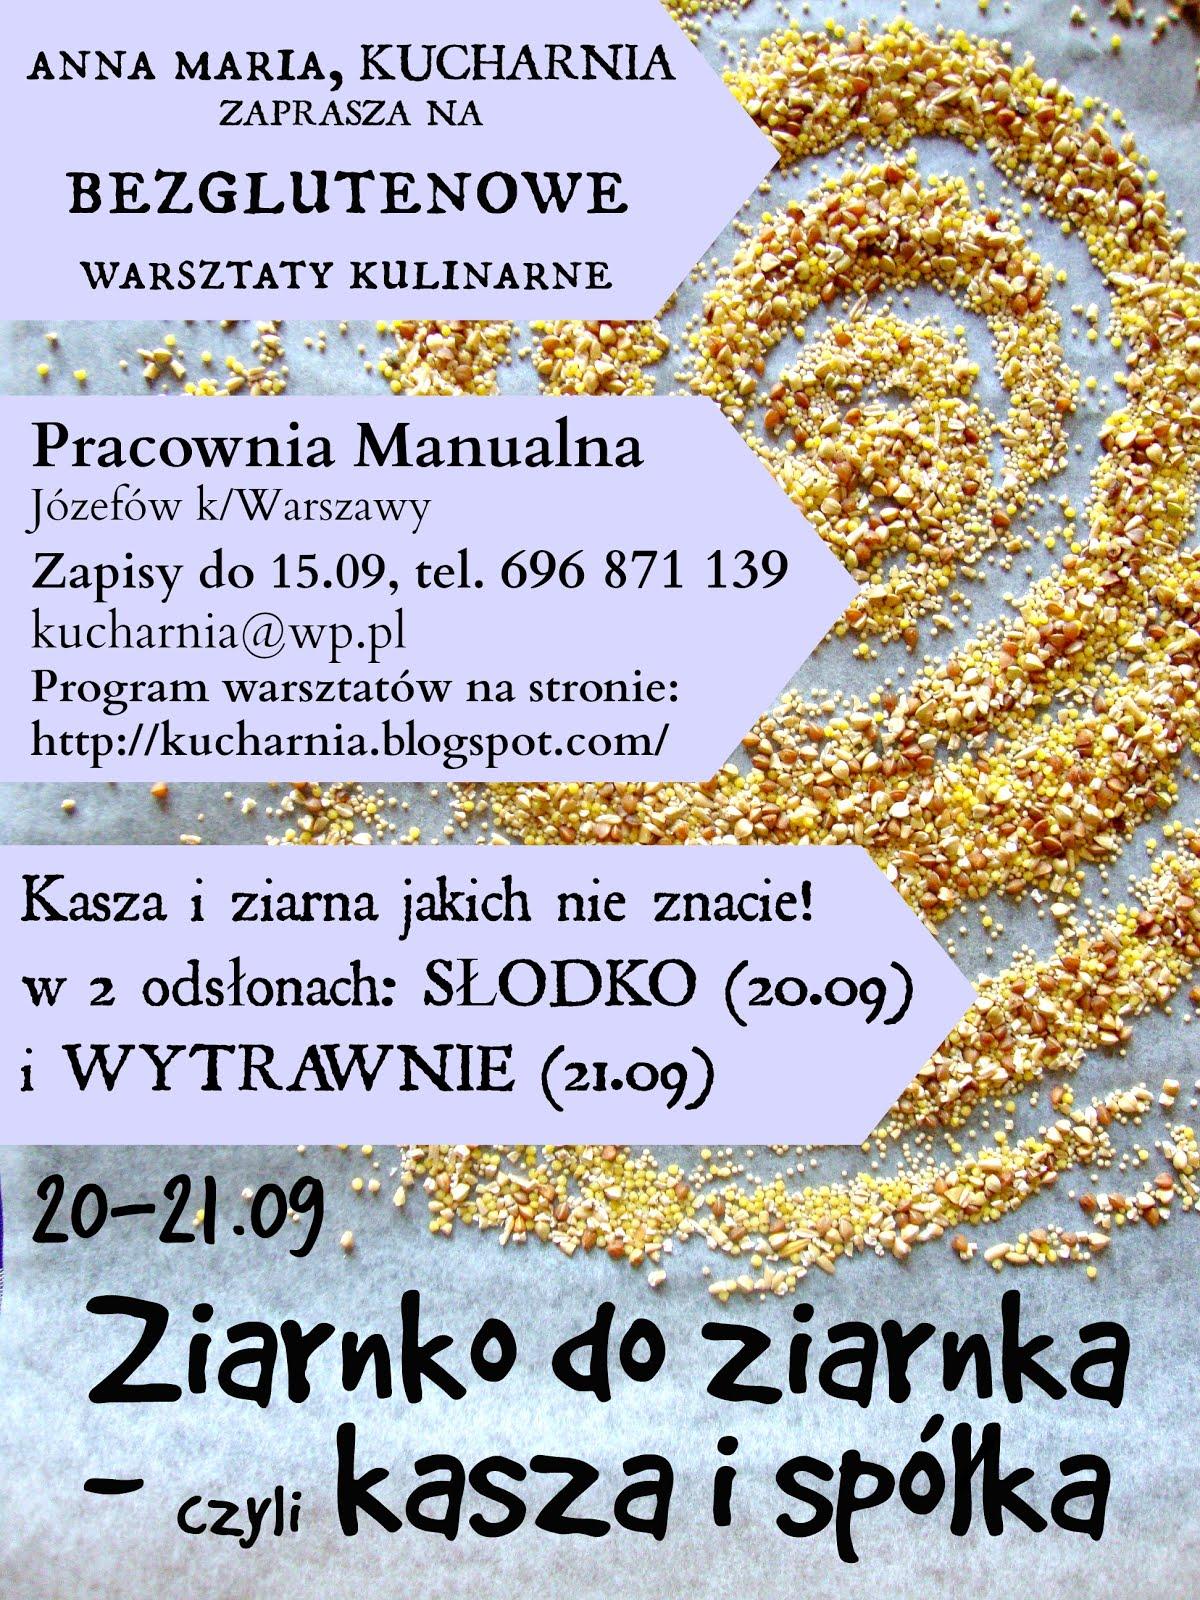 KASZA I SPÓŁKA 20-21.09